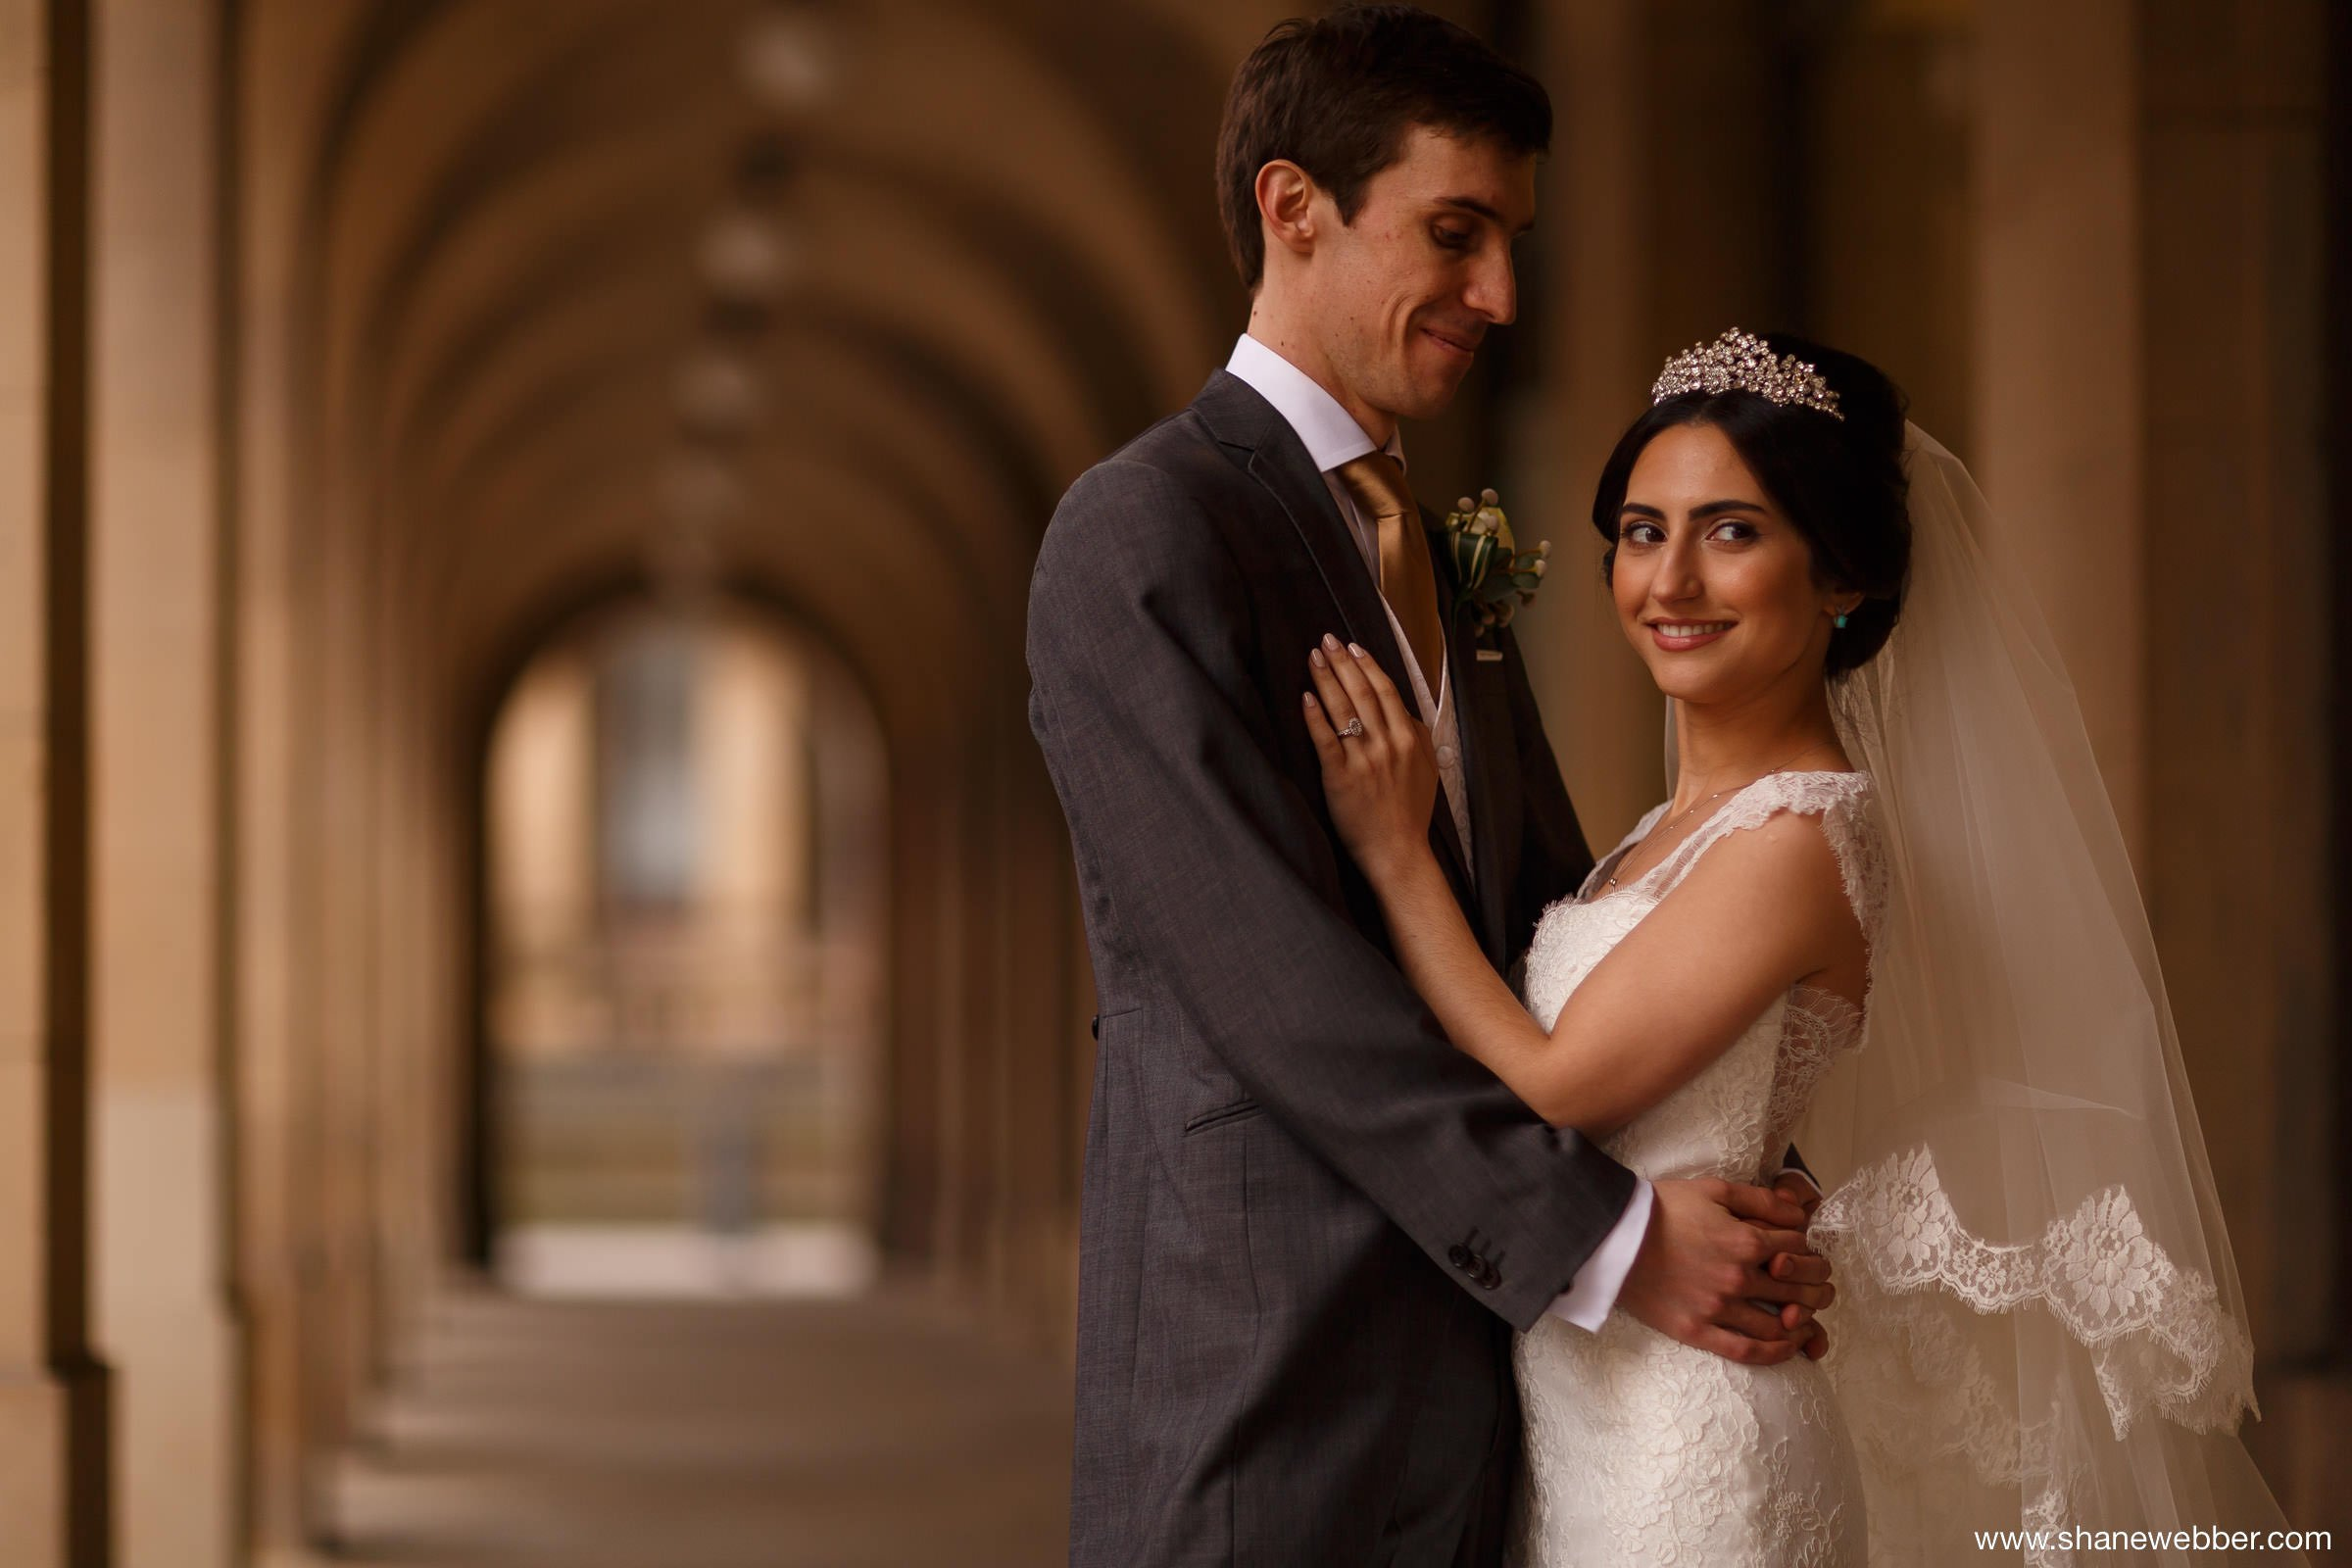 Iranian bride with English groom